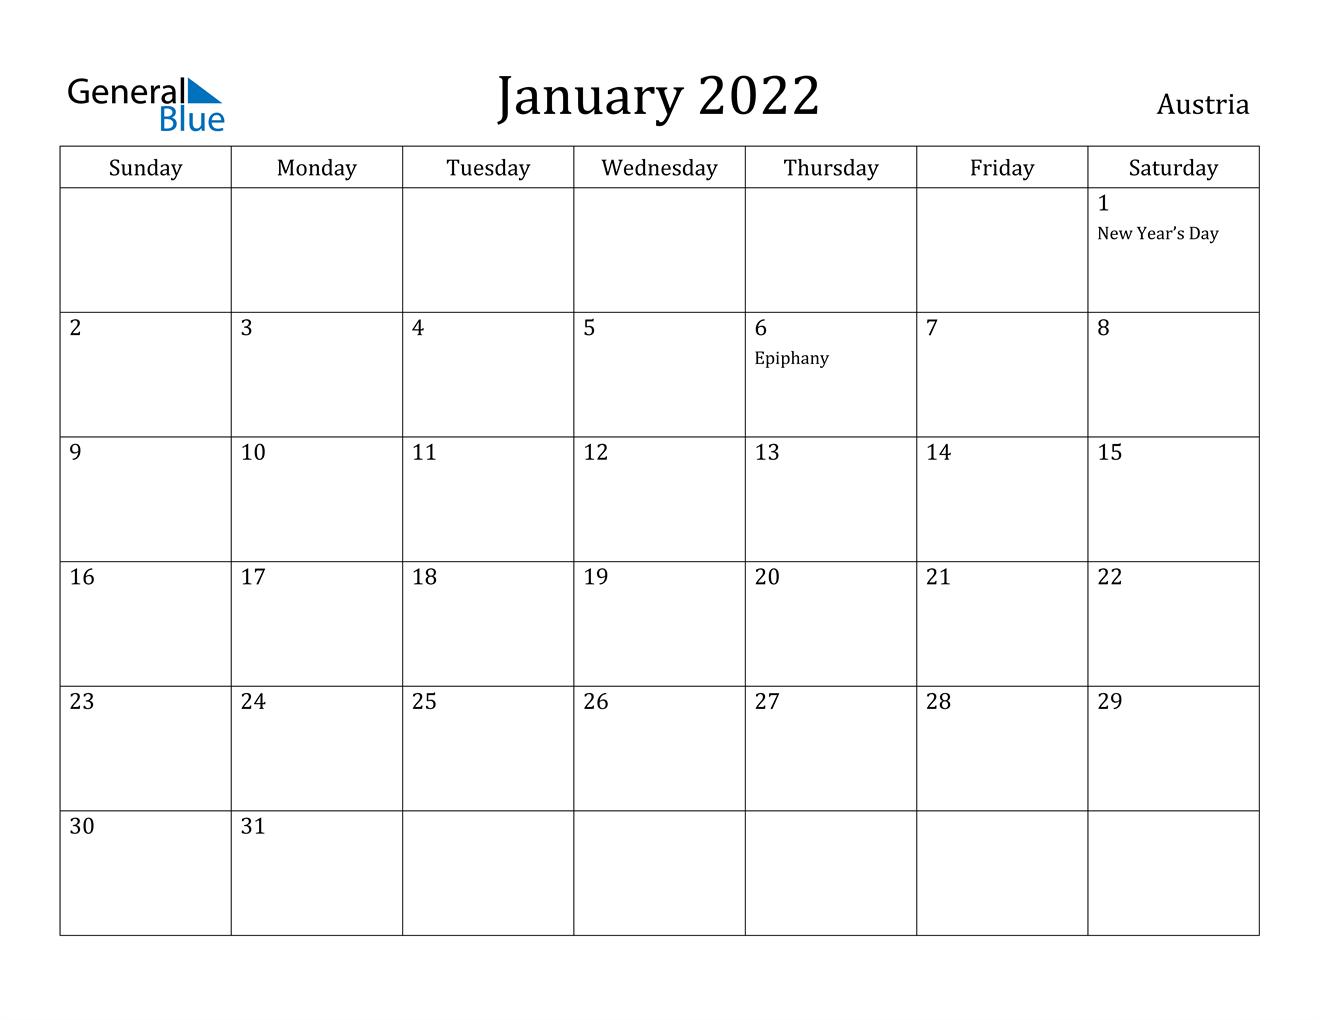 January 2022 Calendar - Austria Intended For Free Printable Calendar January 2022 With Holidays